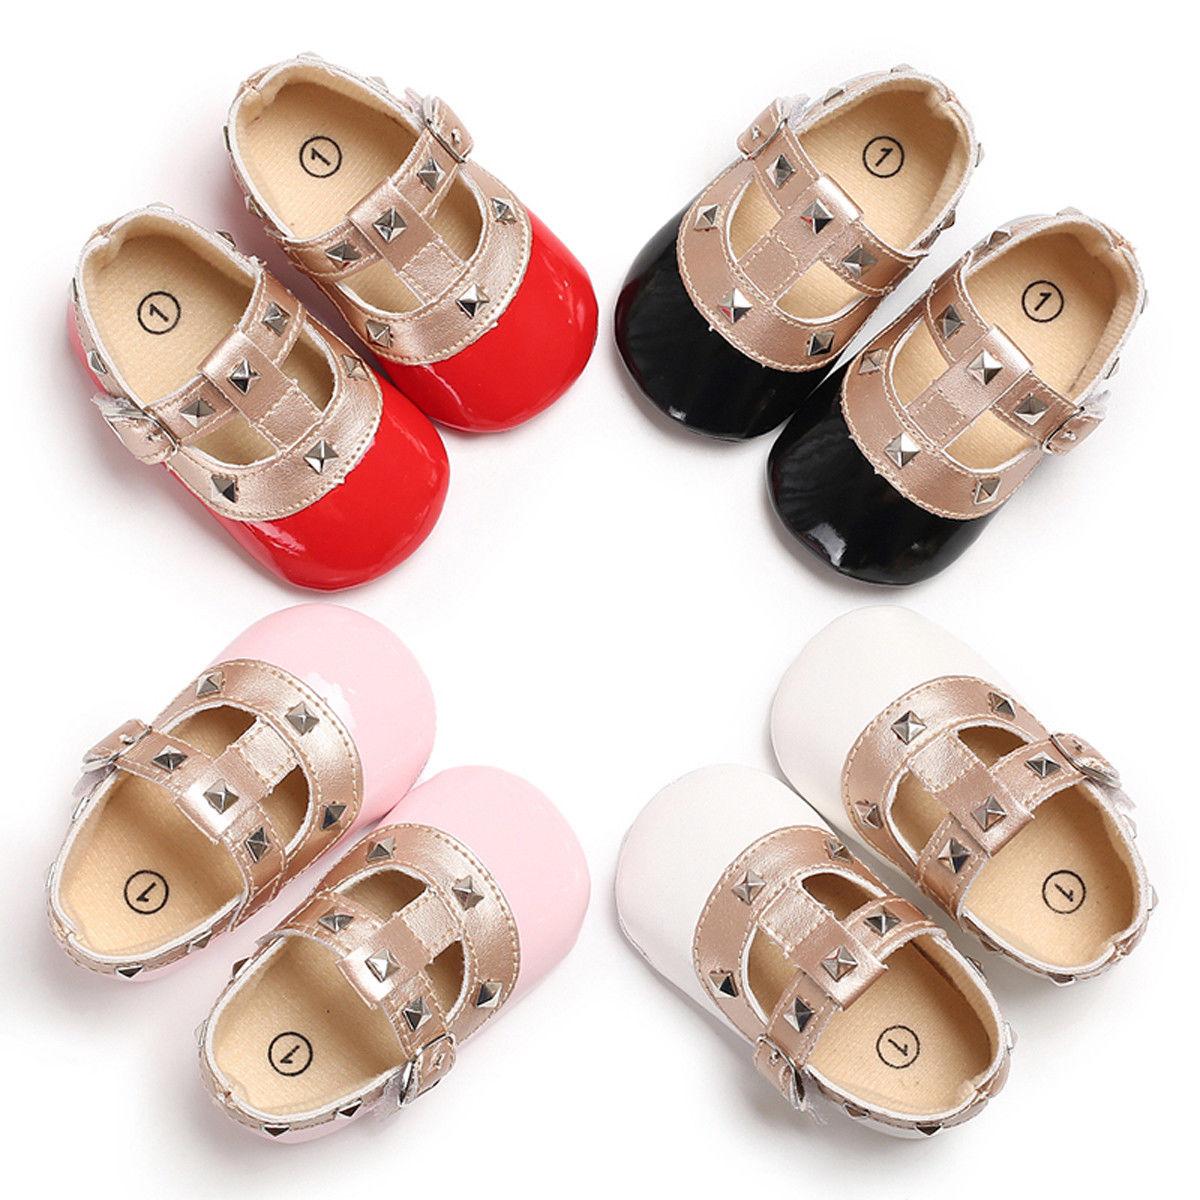 2019 Hot Boutique Newborn Baby Girls Shoes Bow Princess PU Leather Shoes Anti-slip Soft Sole Crib Sneaker Prewalker